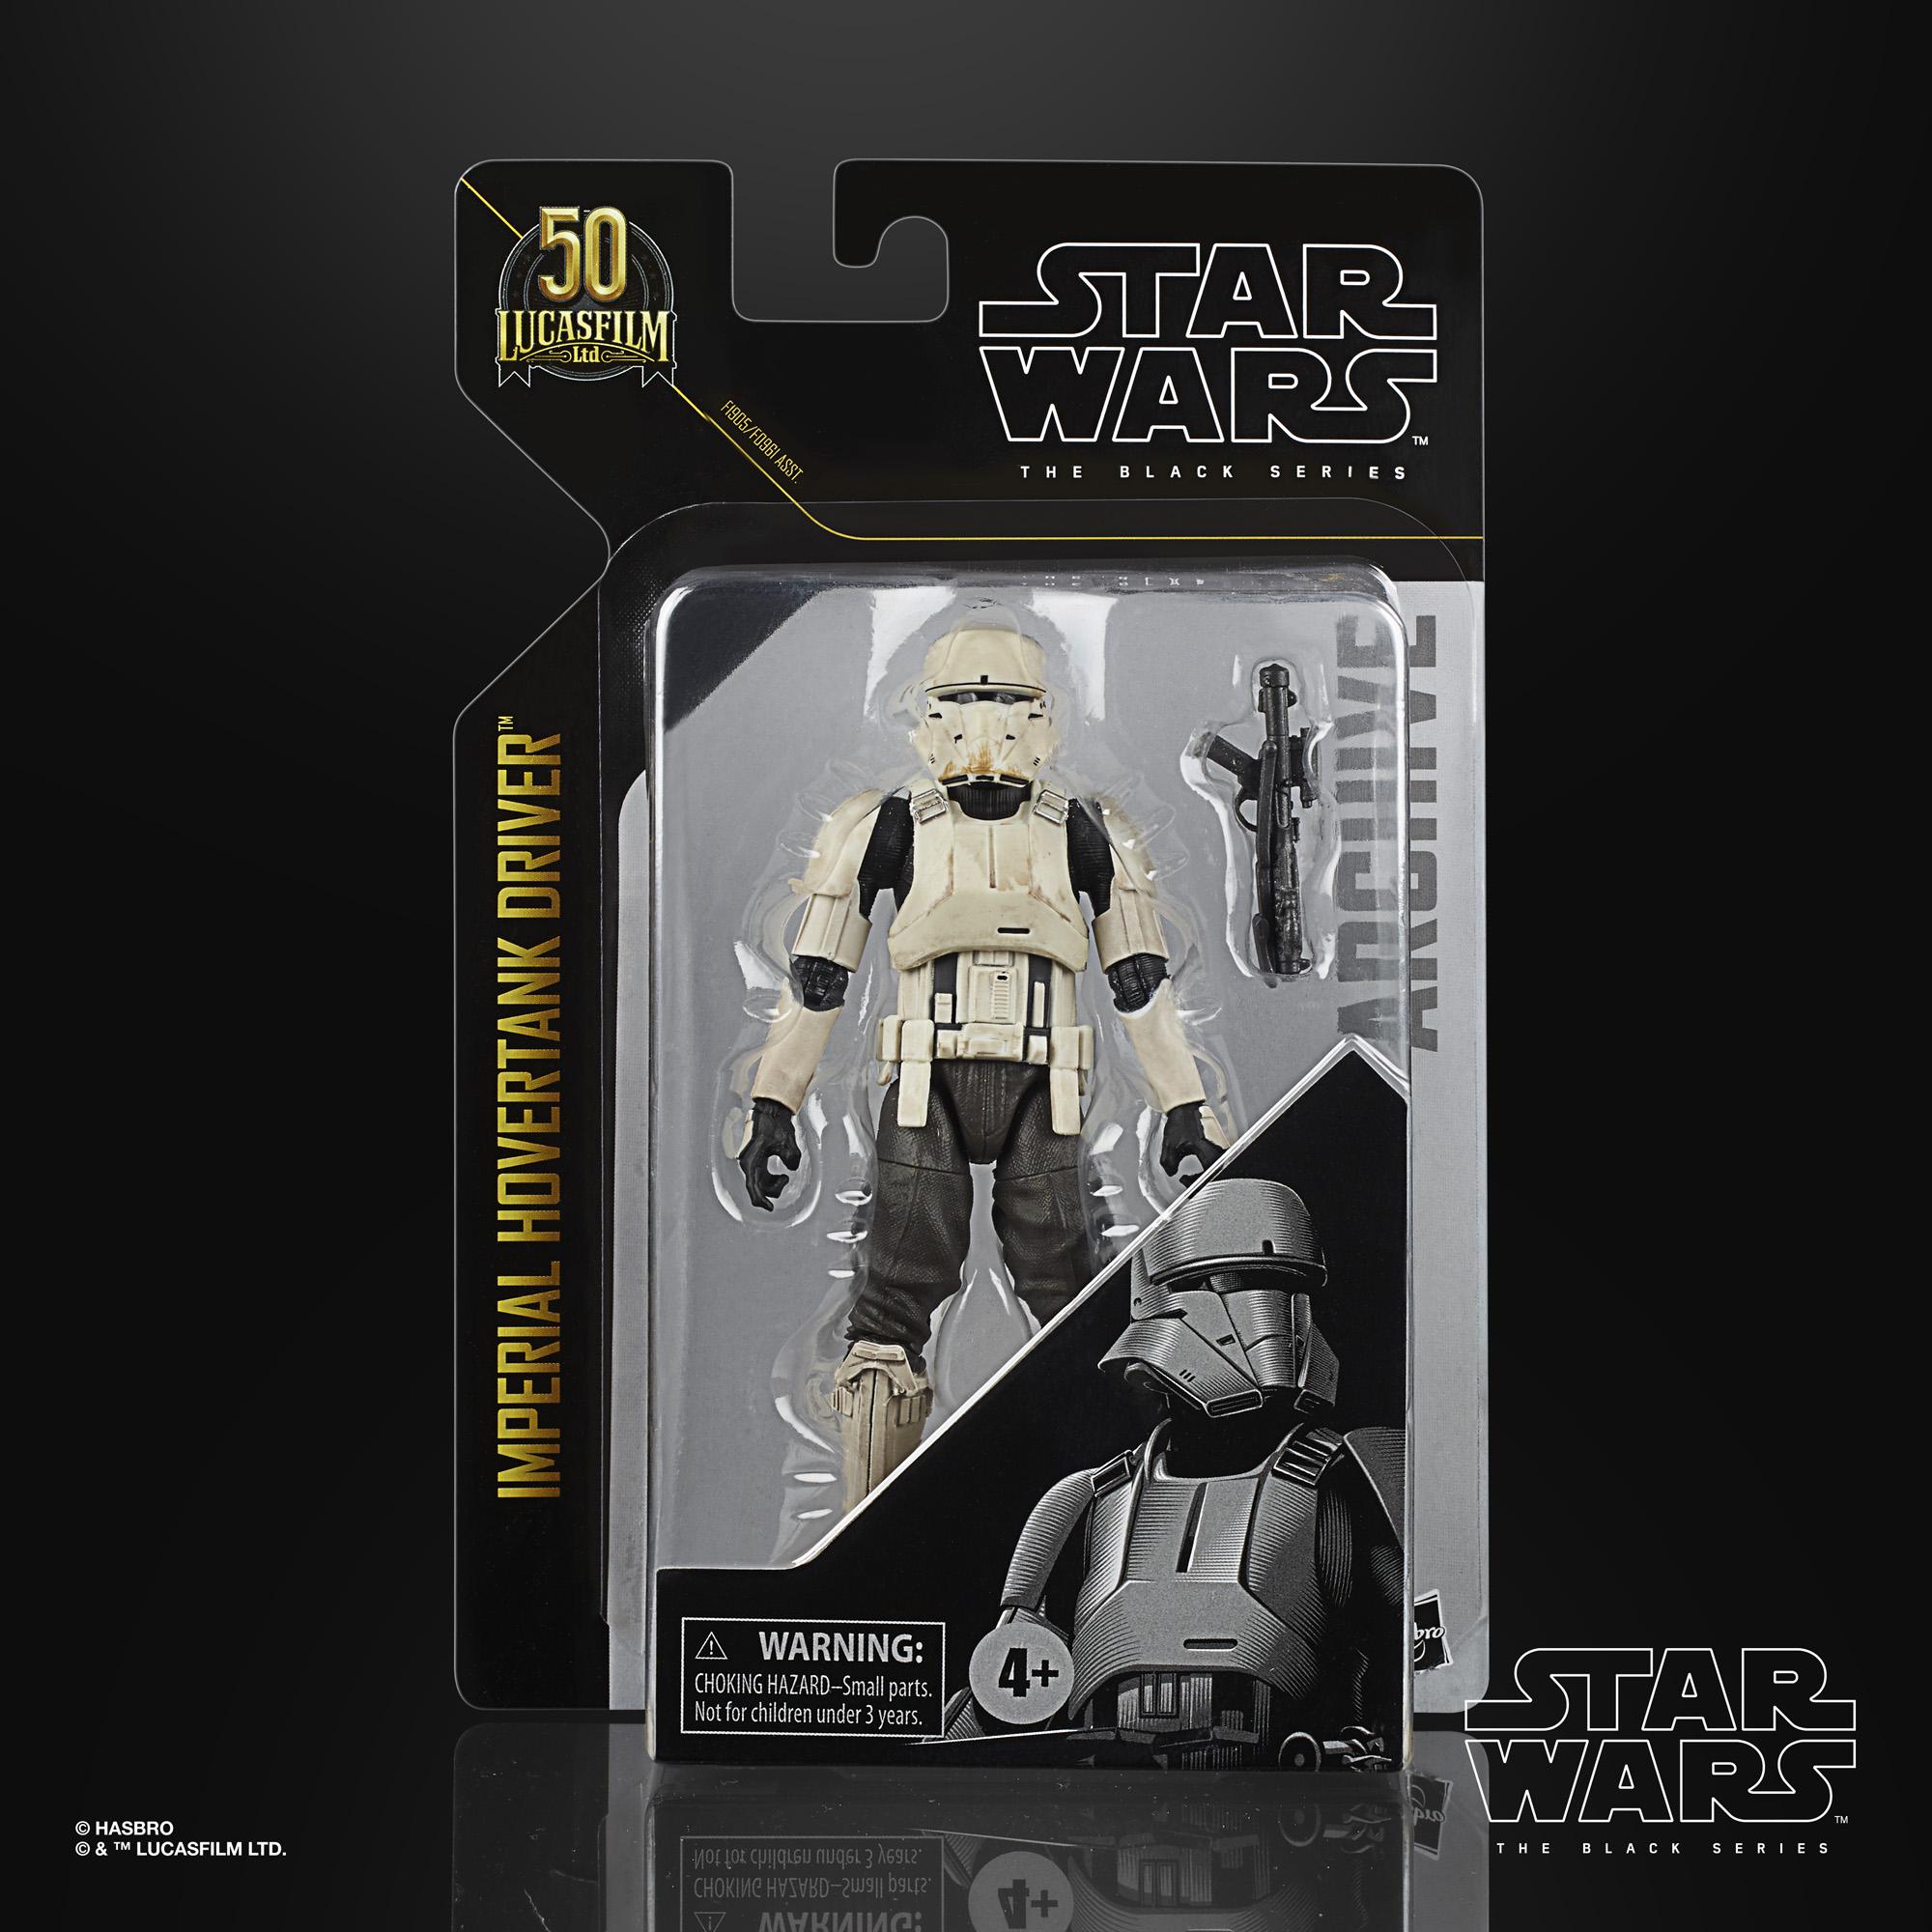 Star Wars The Black Series Archive Figures 15cm Assortment (4) Wave 2 F09615L01